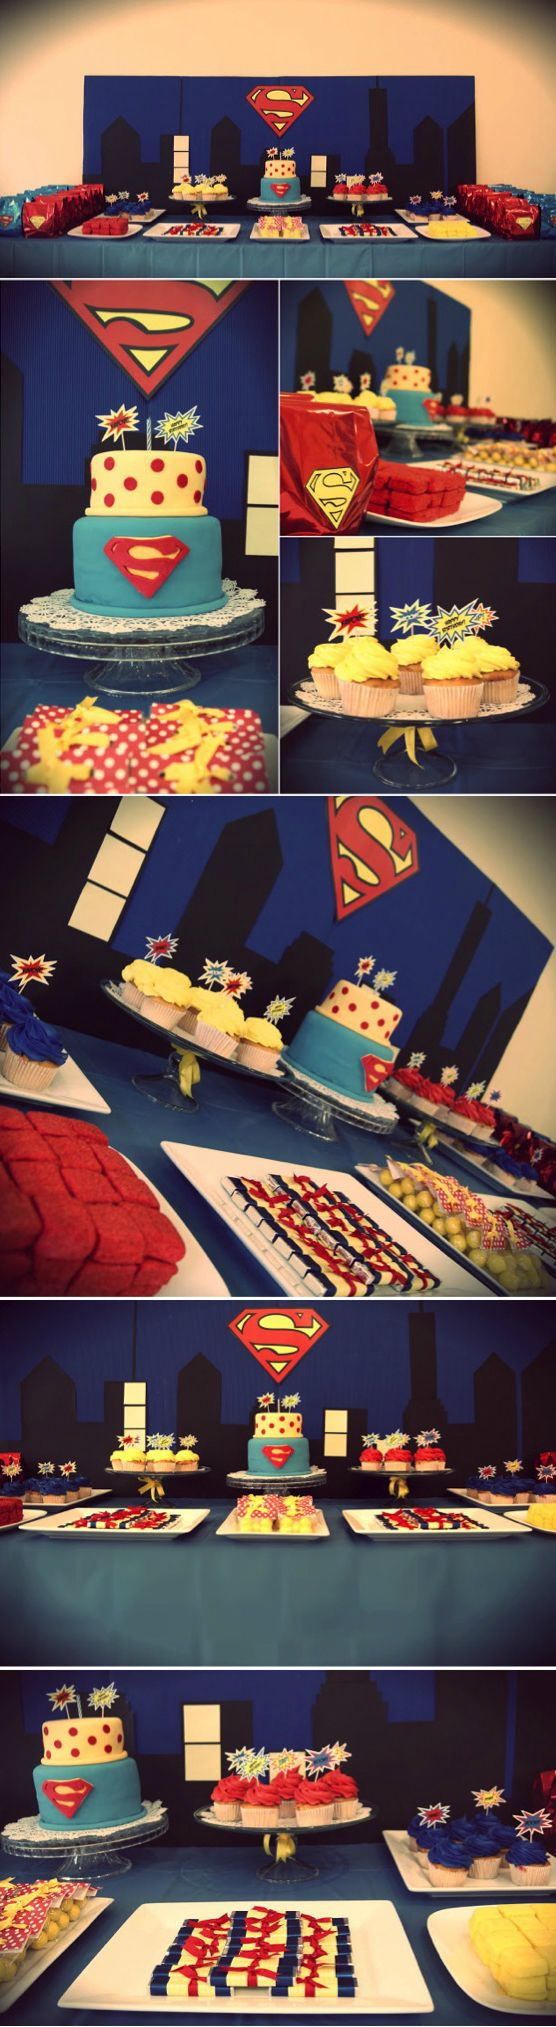 Superman Party Ideas - Ideas para Fiesta de Superman #DIY #party #decor - Sweet Table: Superman Birthday Party / Superhero theme for dessert table / Superman Inspired - Mesa de postres y dulces